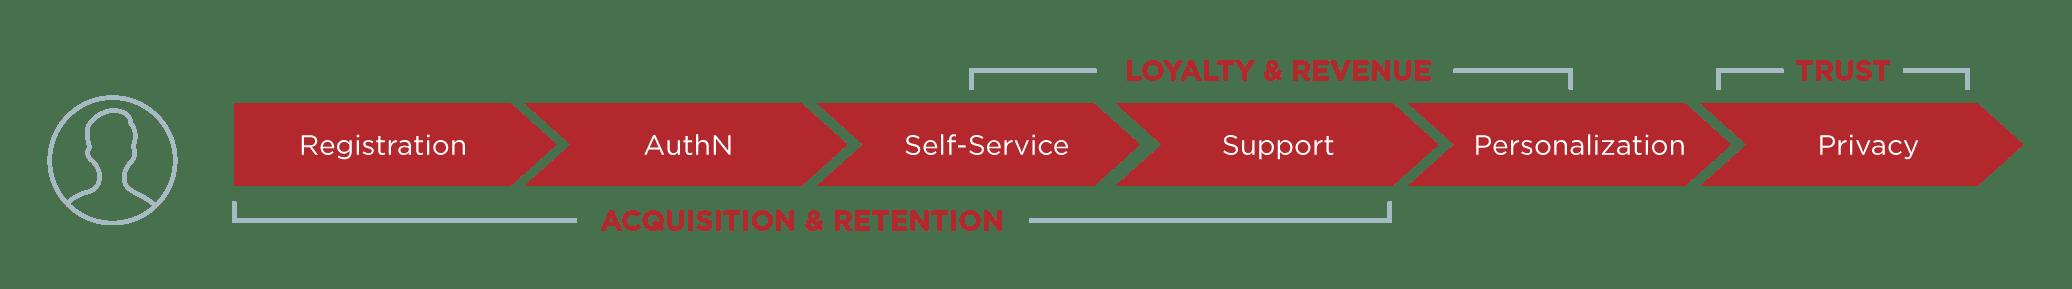 Customer retention line graph